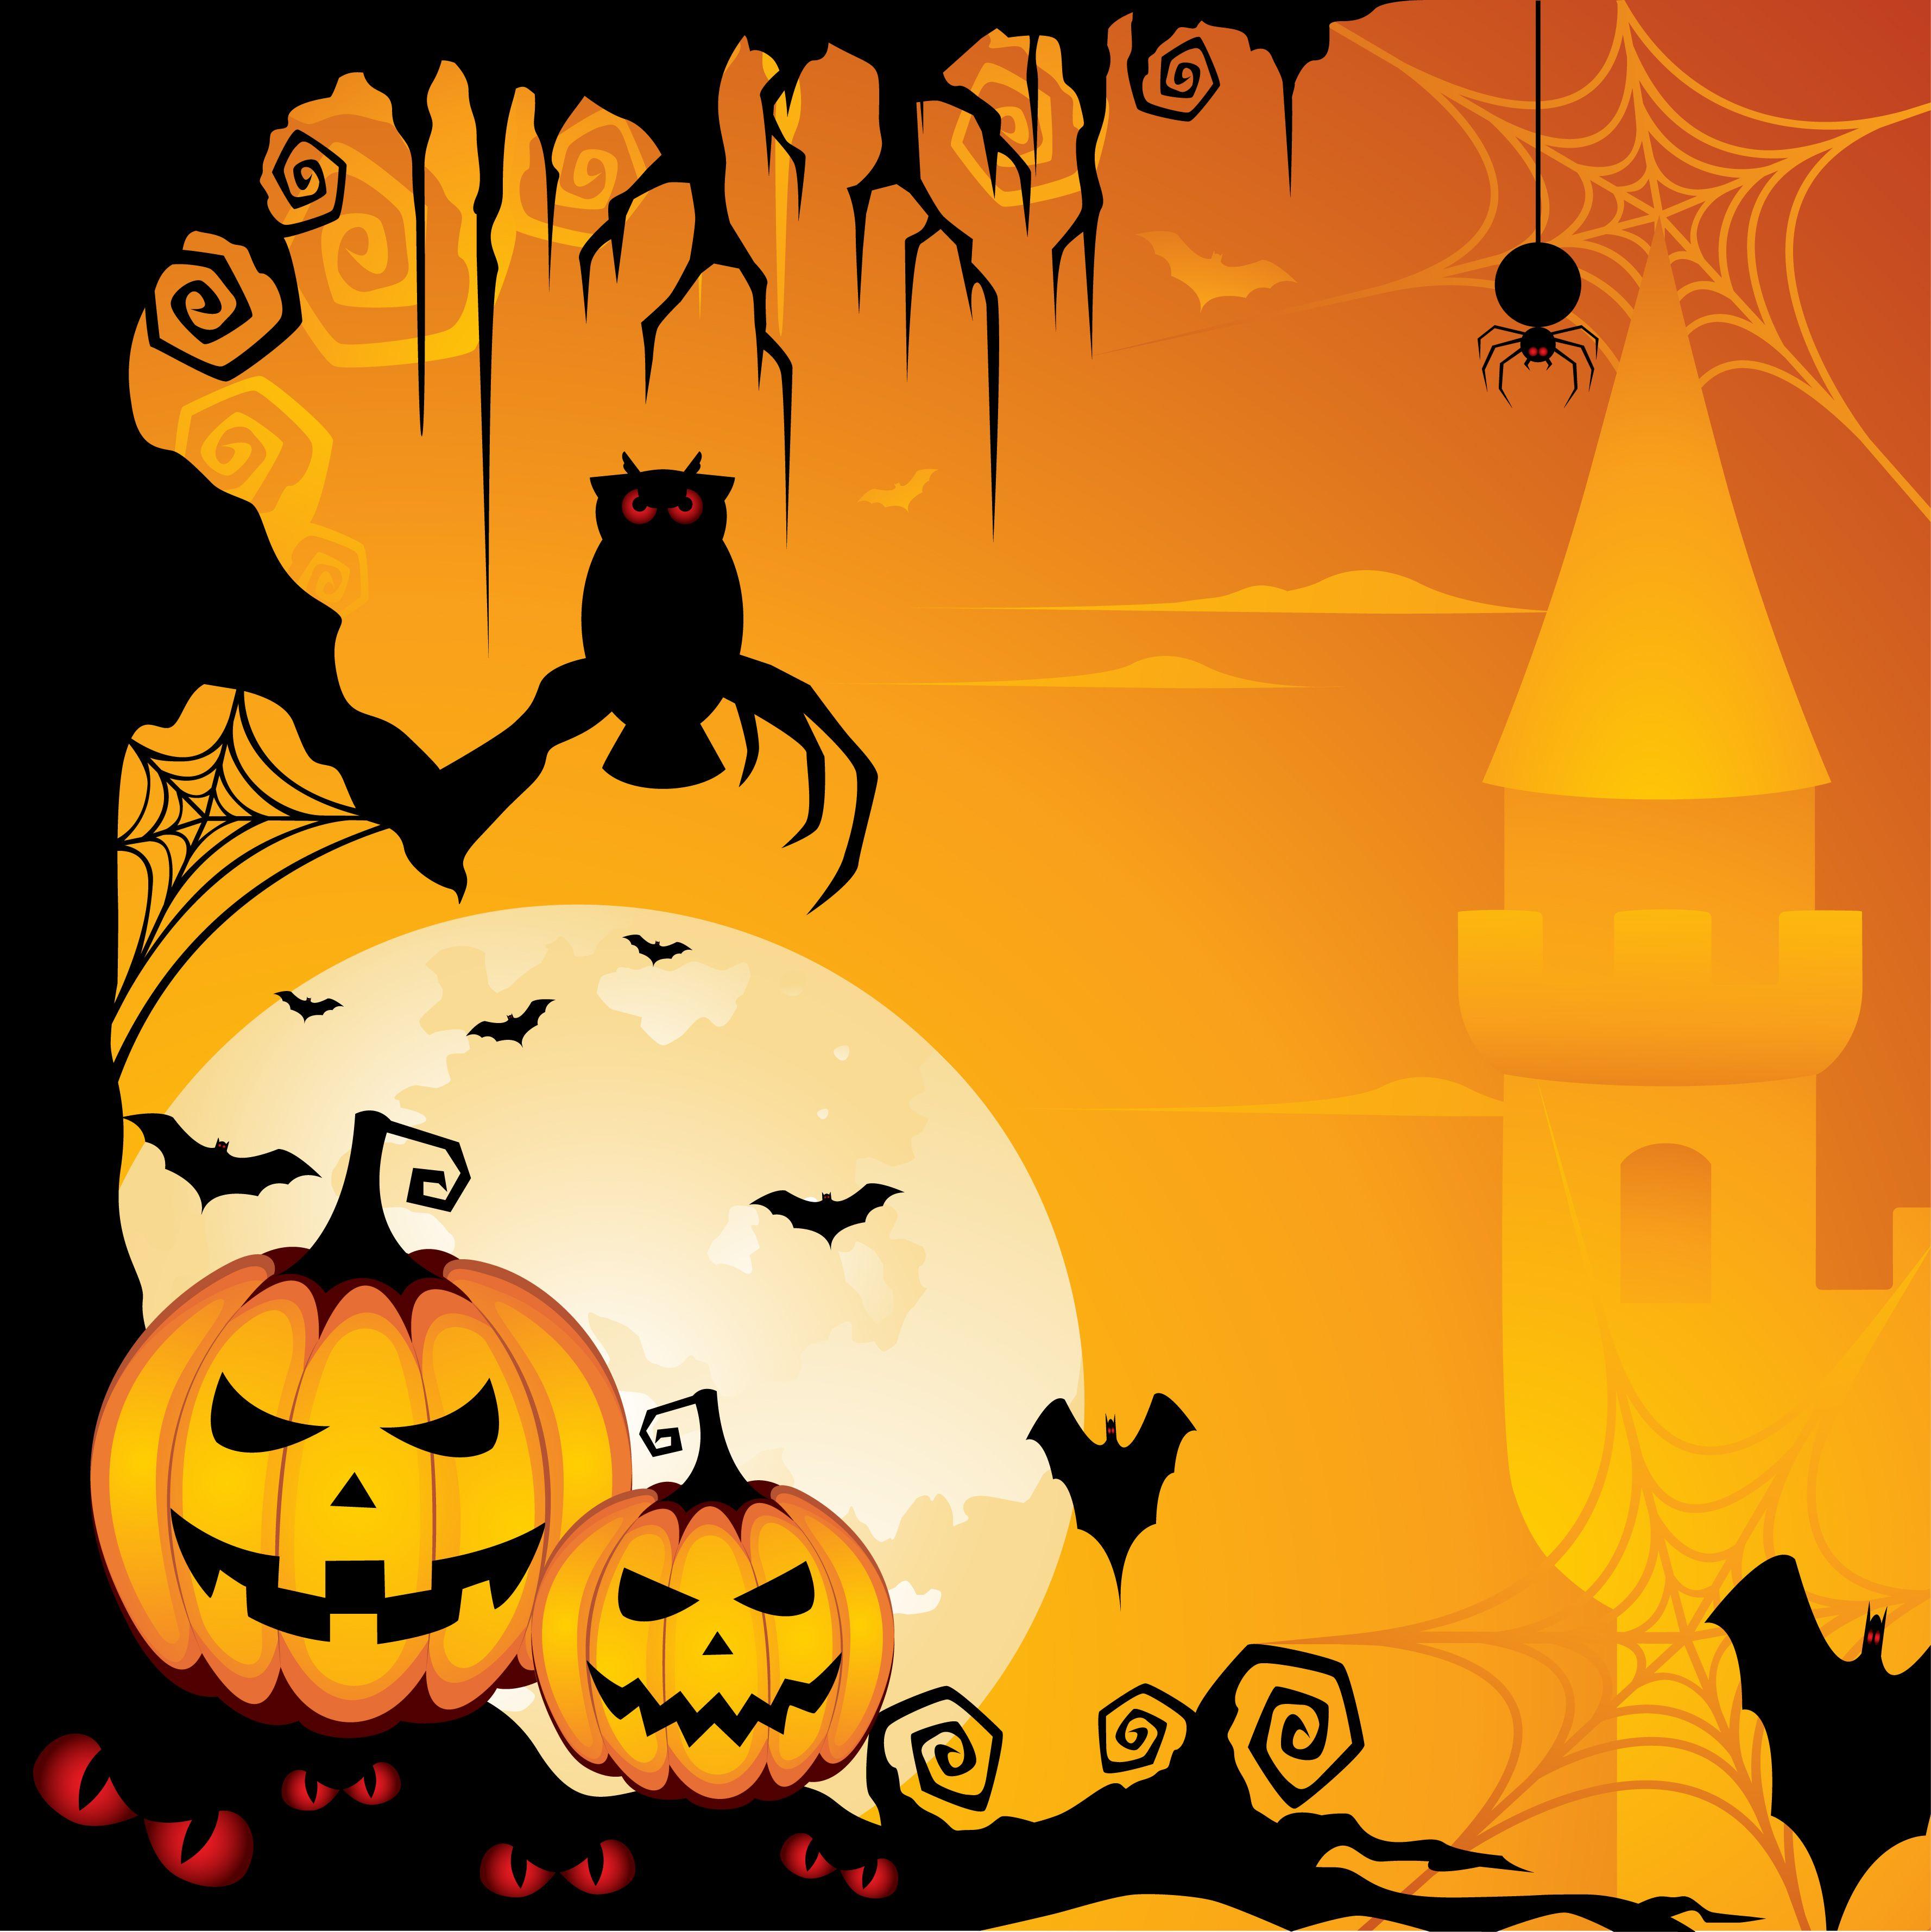 Can T Wait For Halloween Halloween Backgrounds Halloween Prints Scary Halloween Pumpkins